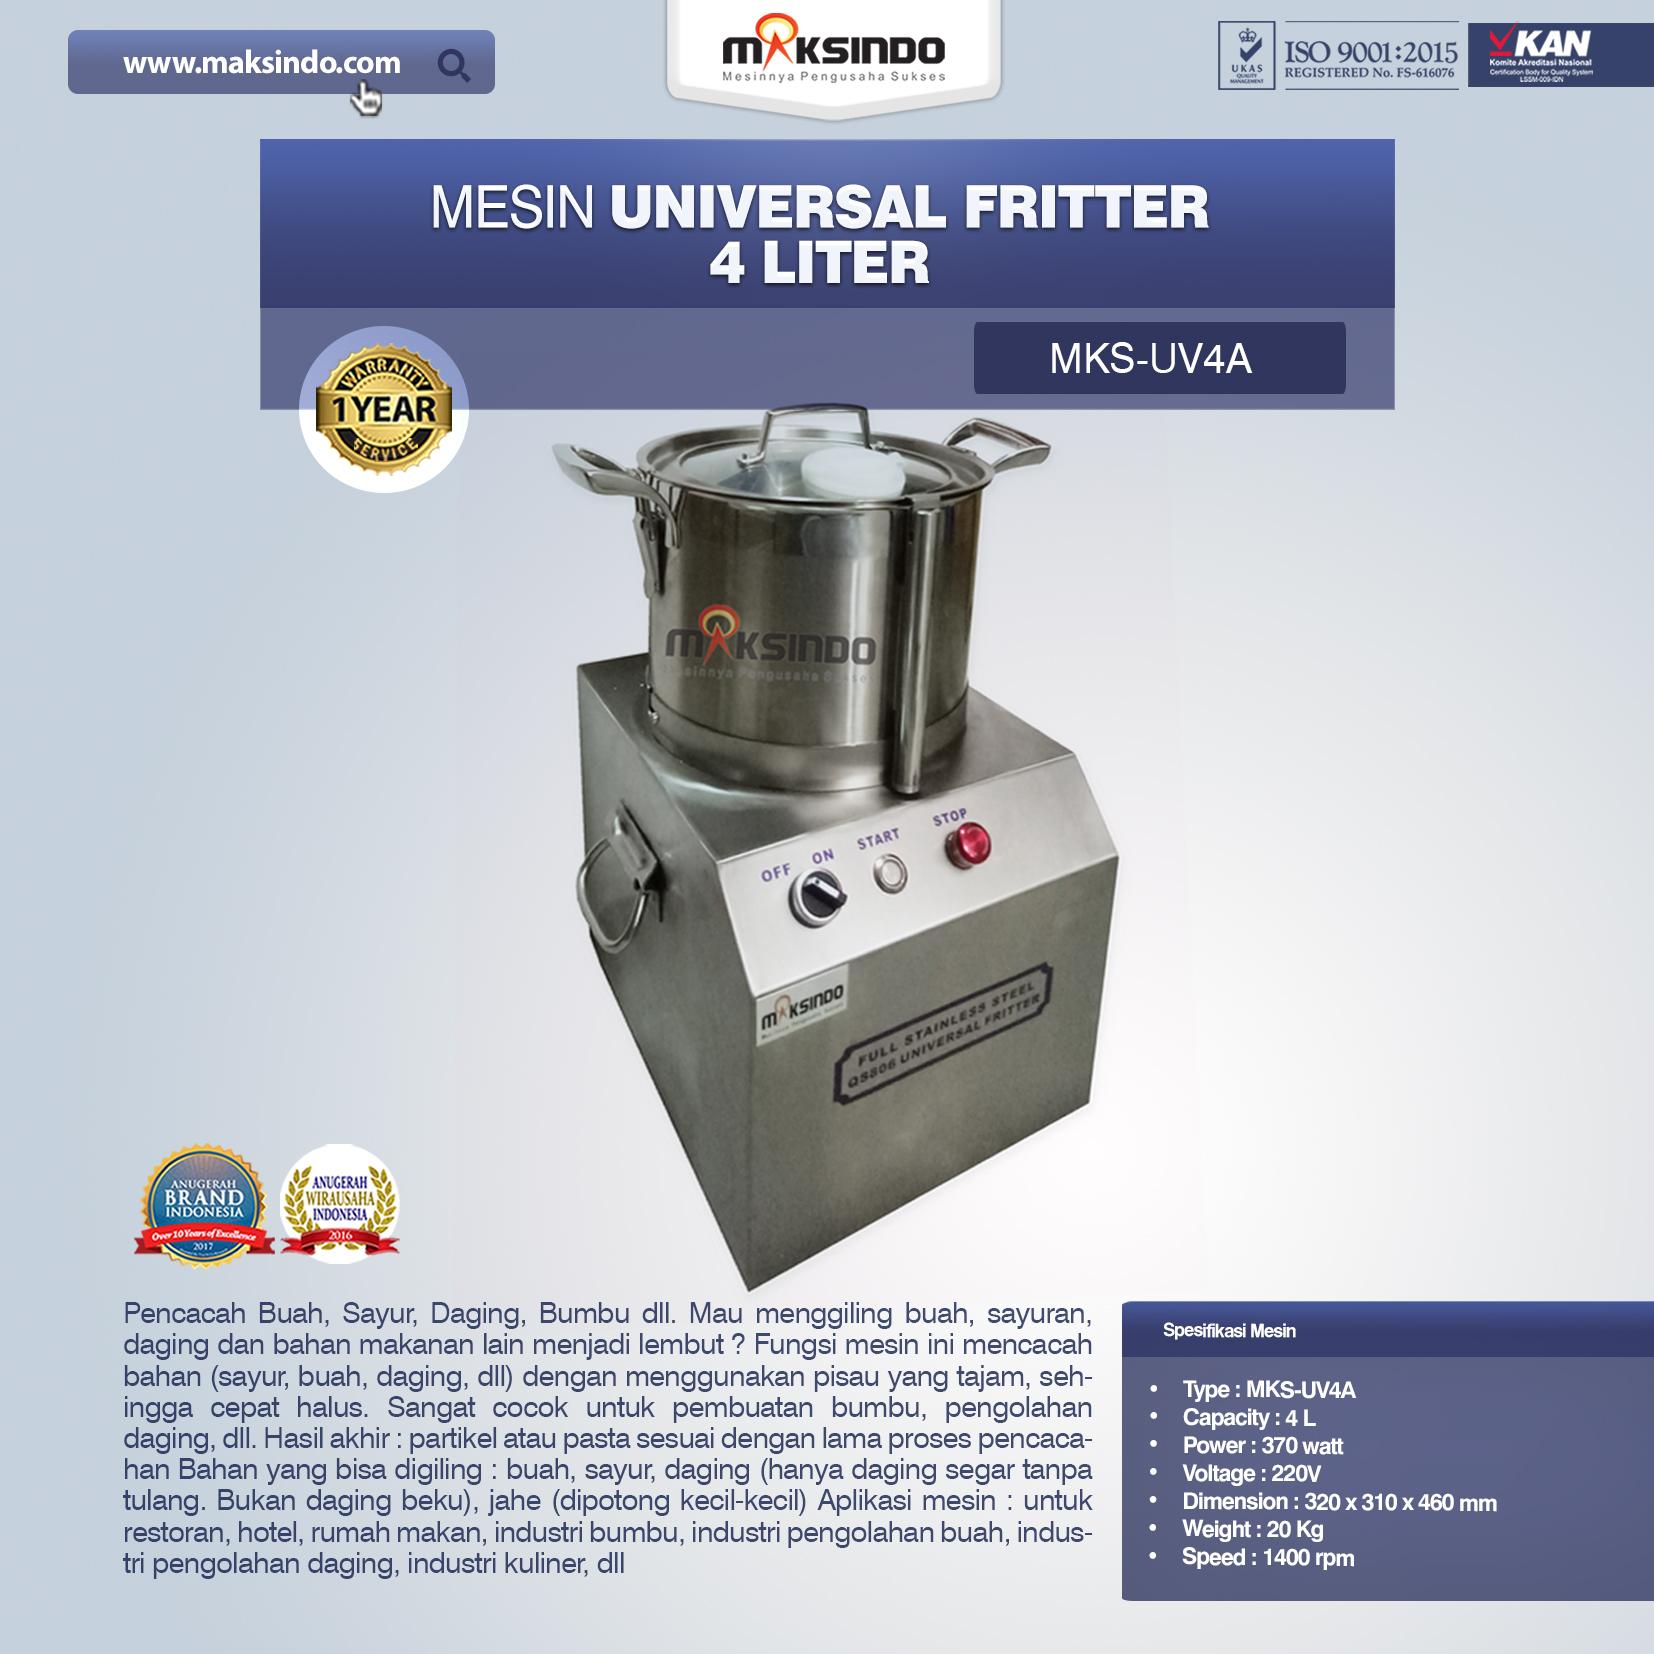 Jual Universal Fritter 4 Liter (MKS-UV4A) di Bali